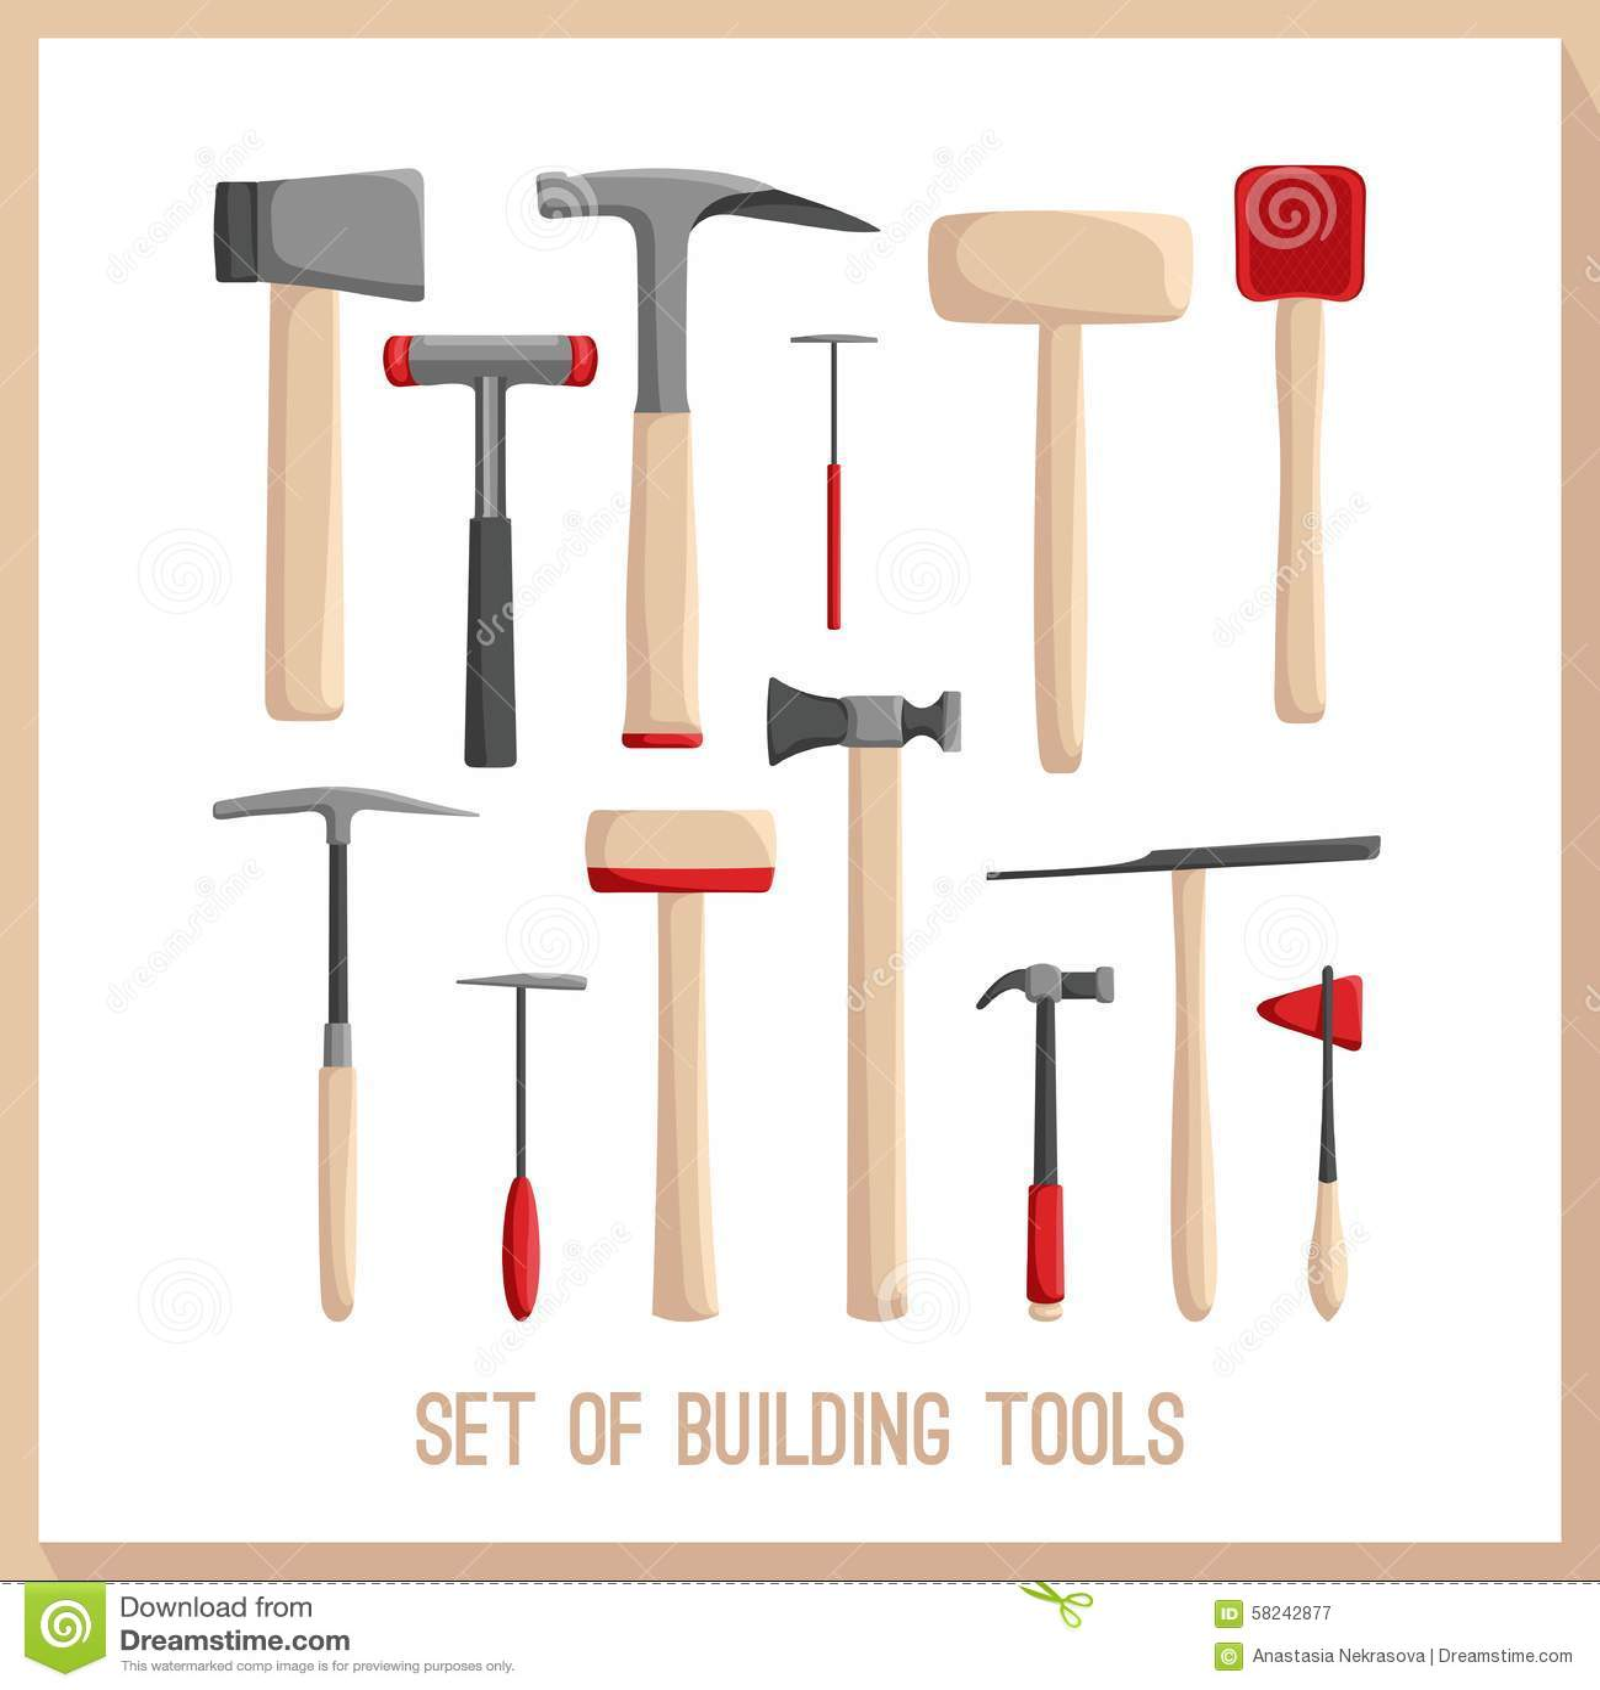 Set Of Building Tools Buildings Tools Icons Set Flat